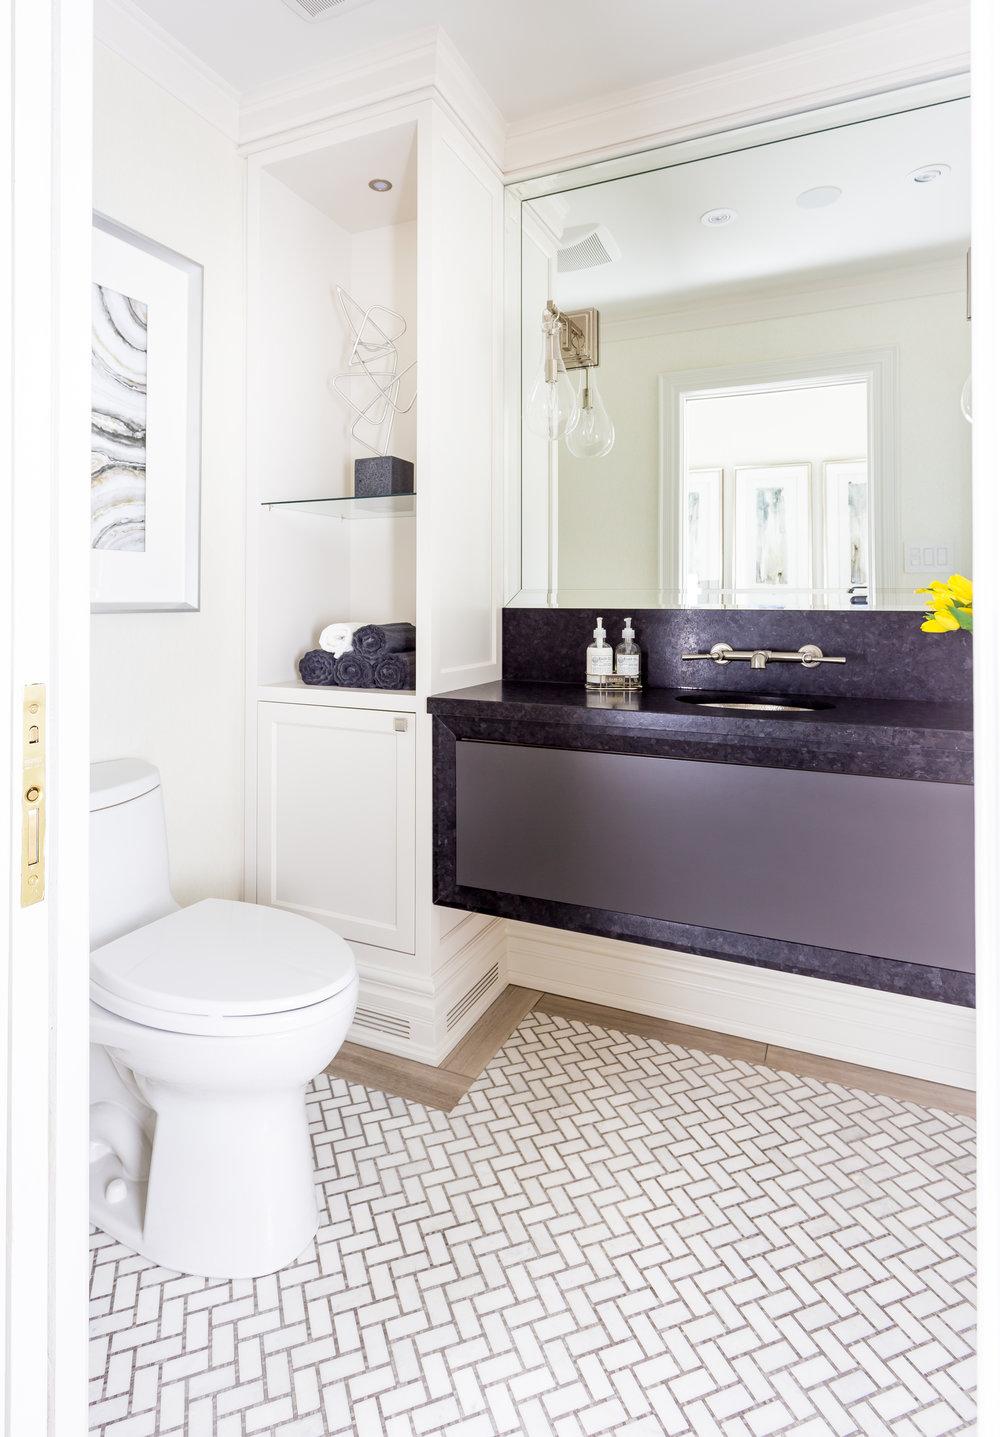 oakville-interior design-powder room-vanity-robson hallford